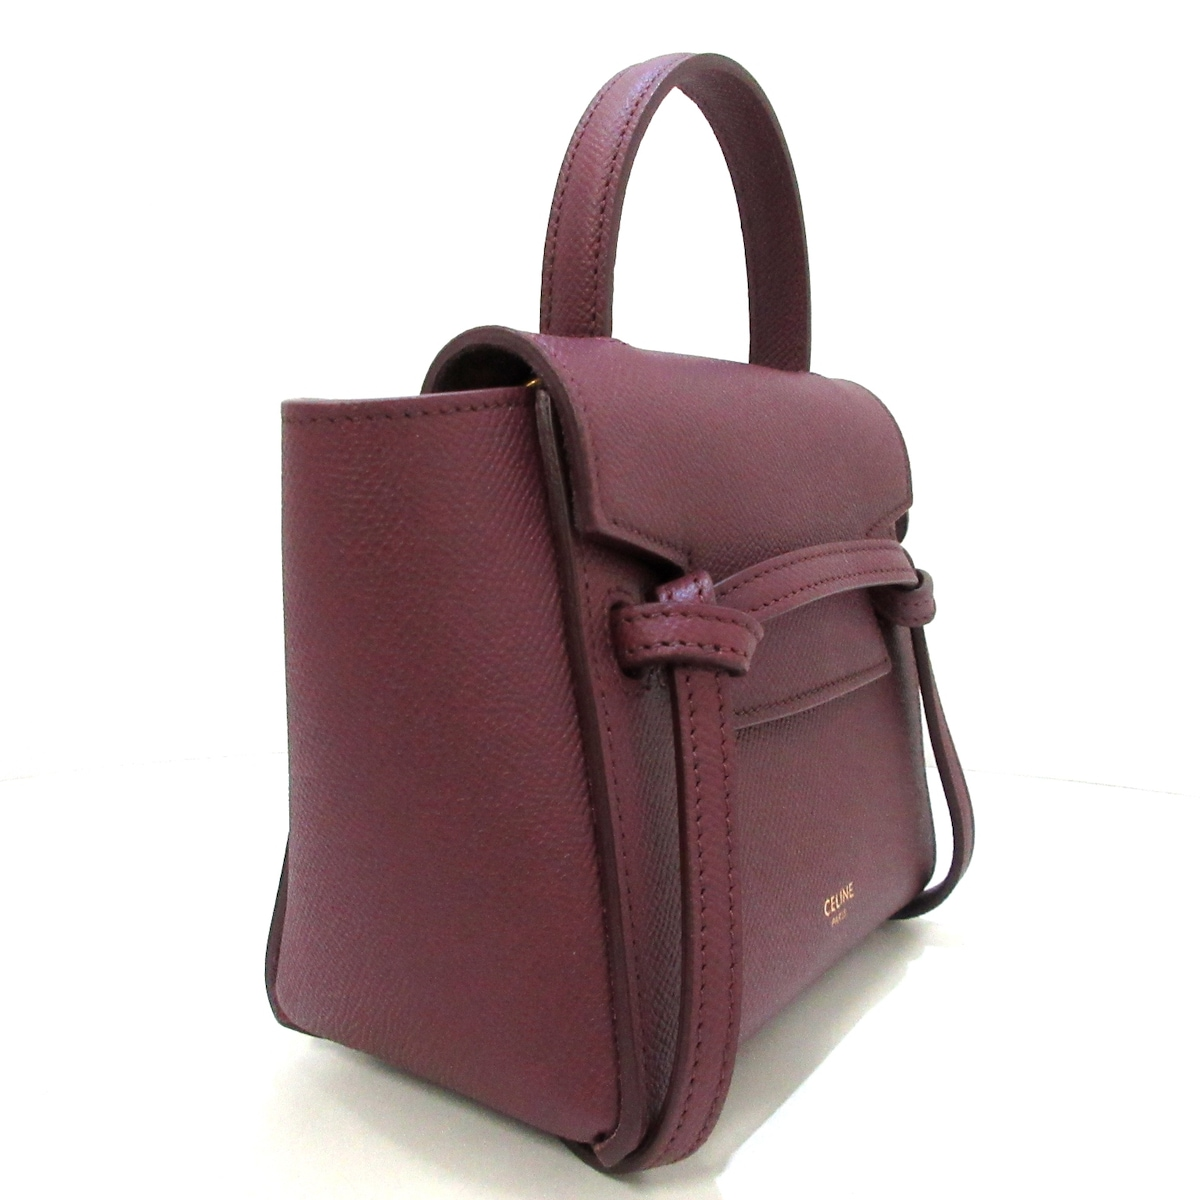 CELINE(セリーヌ)のピコ ベルトバッグ